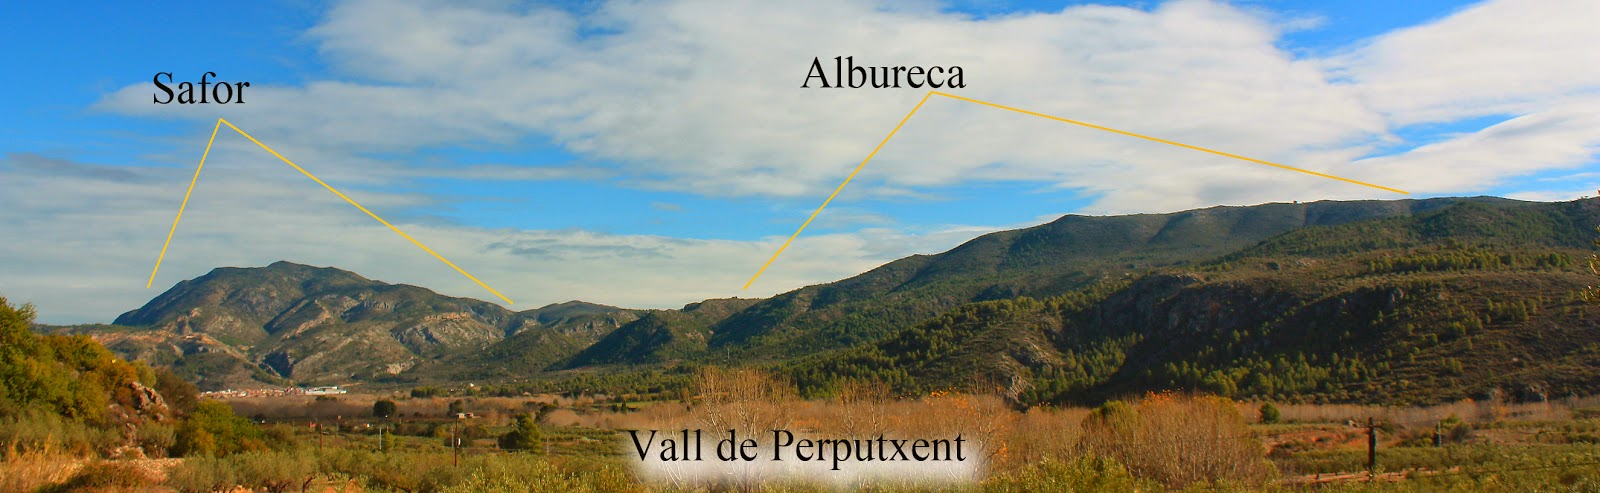 Vall de Perputxent, Safor, Albureca